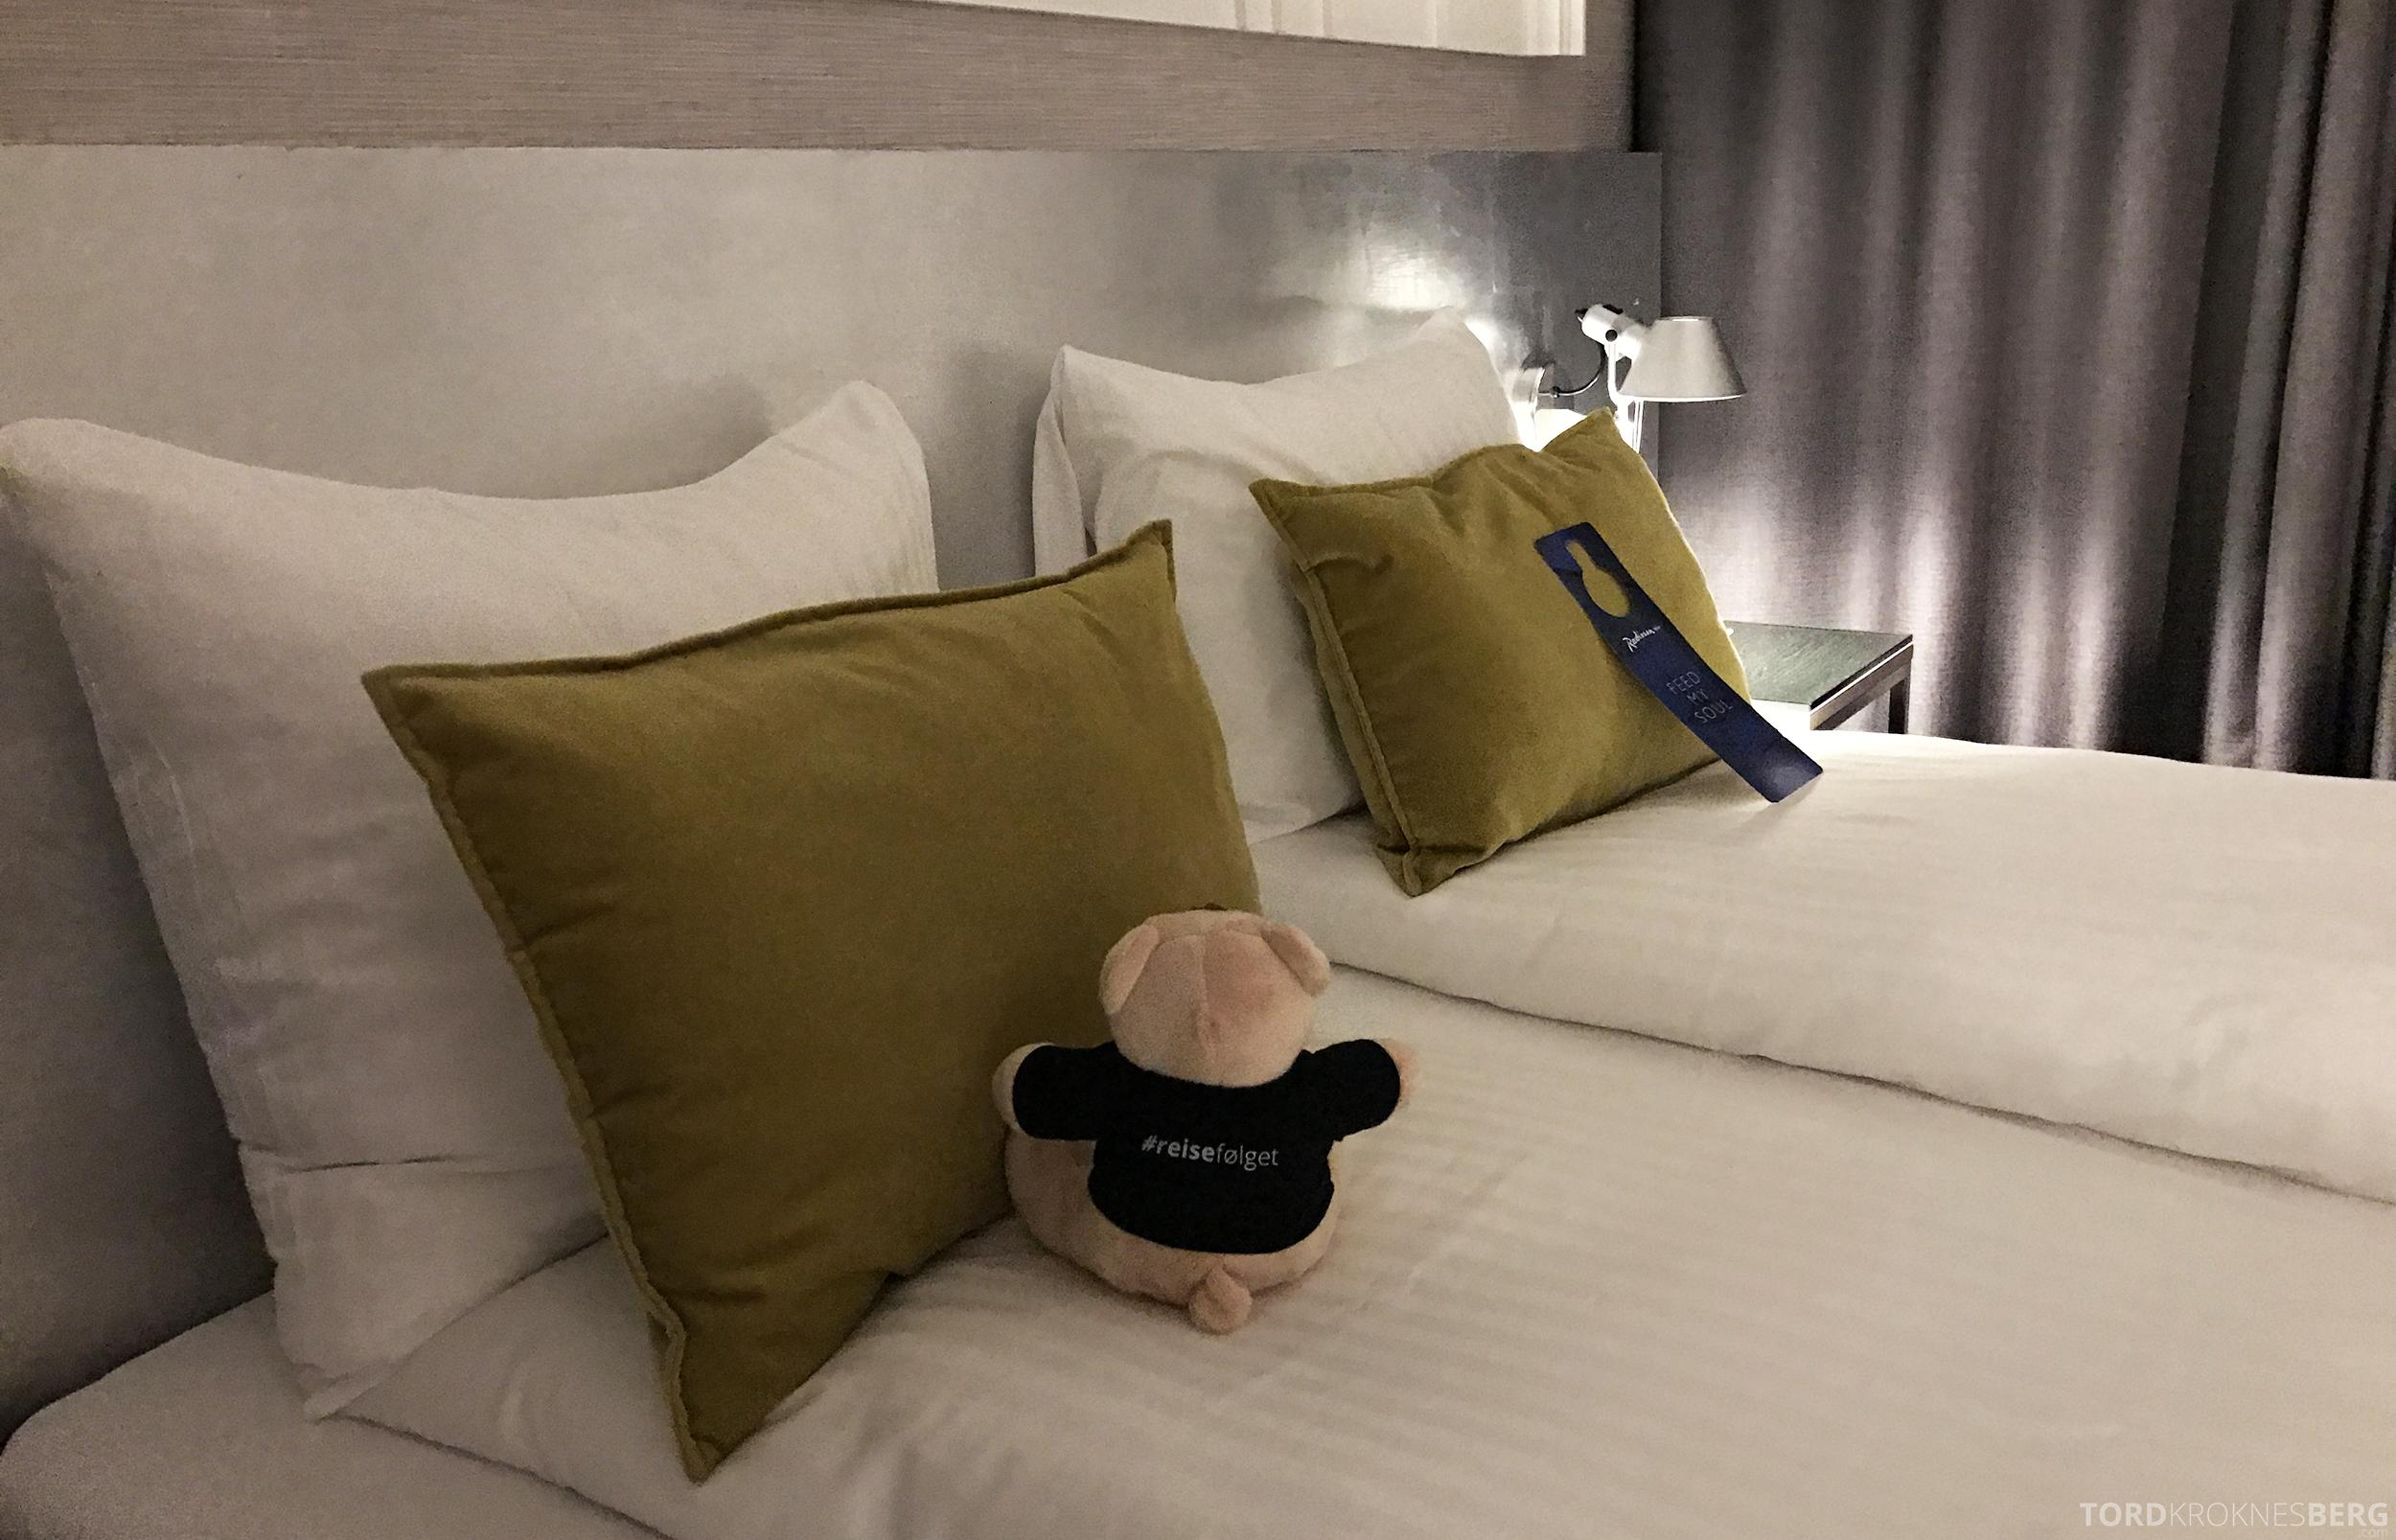 Radisson Blu Oslo Airport Hotel suite reisefølget seng